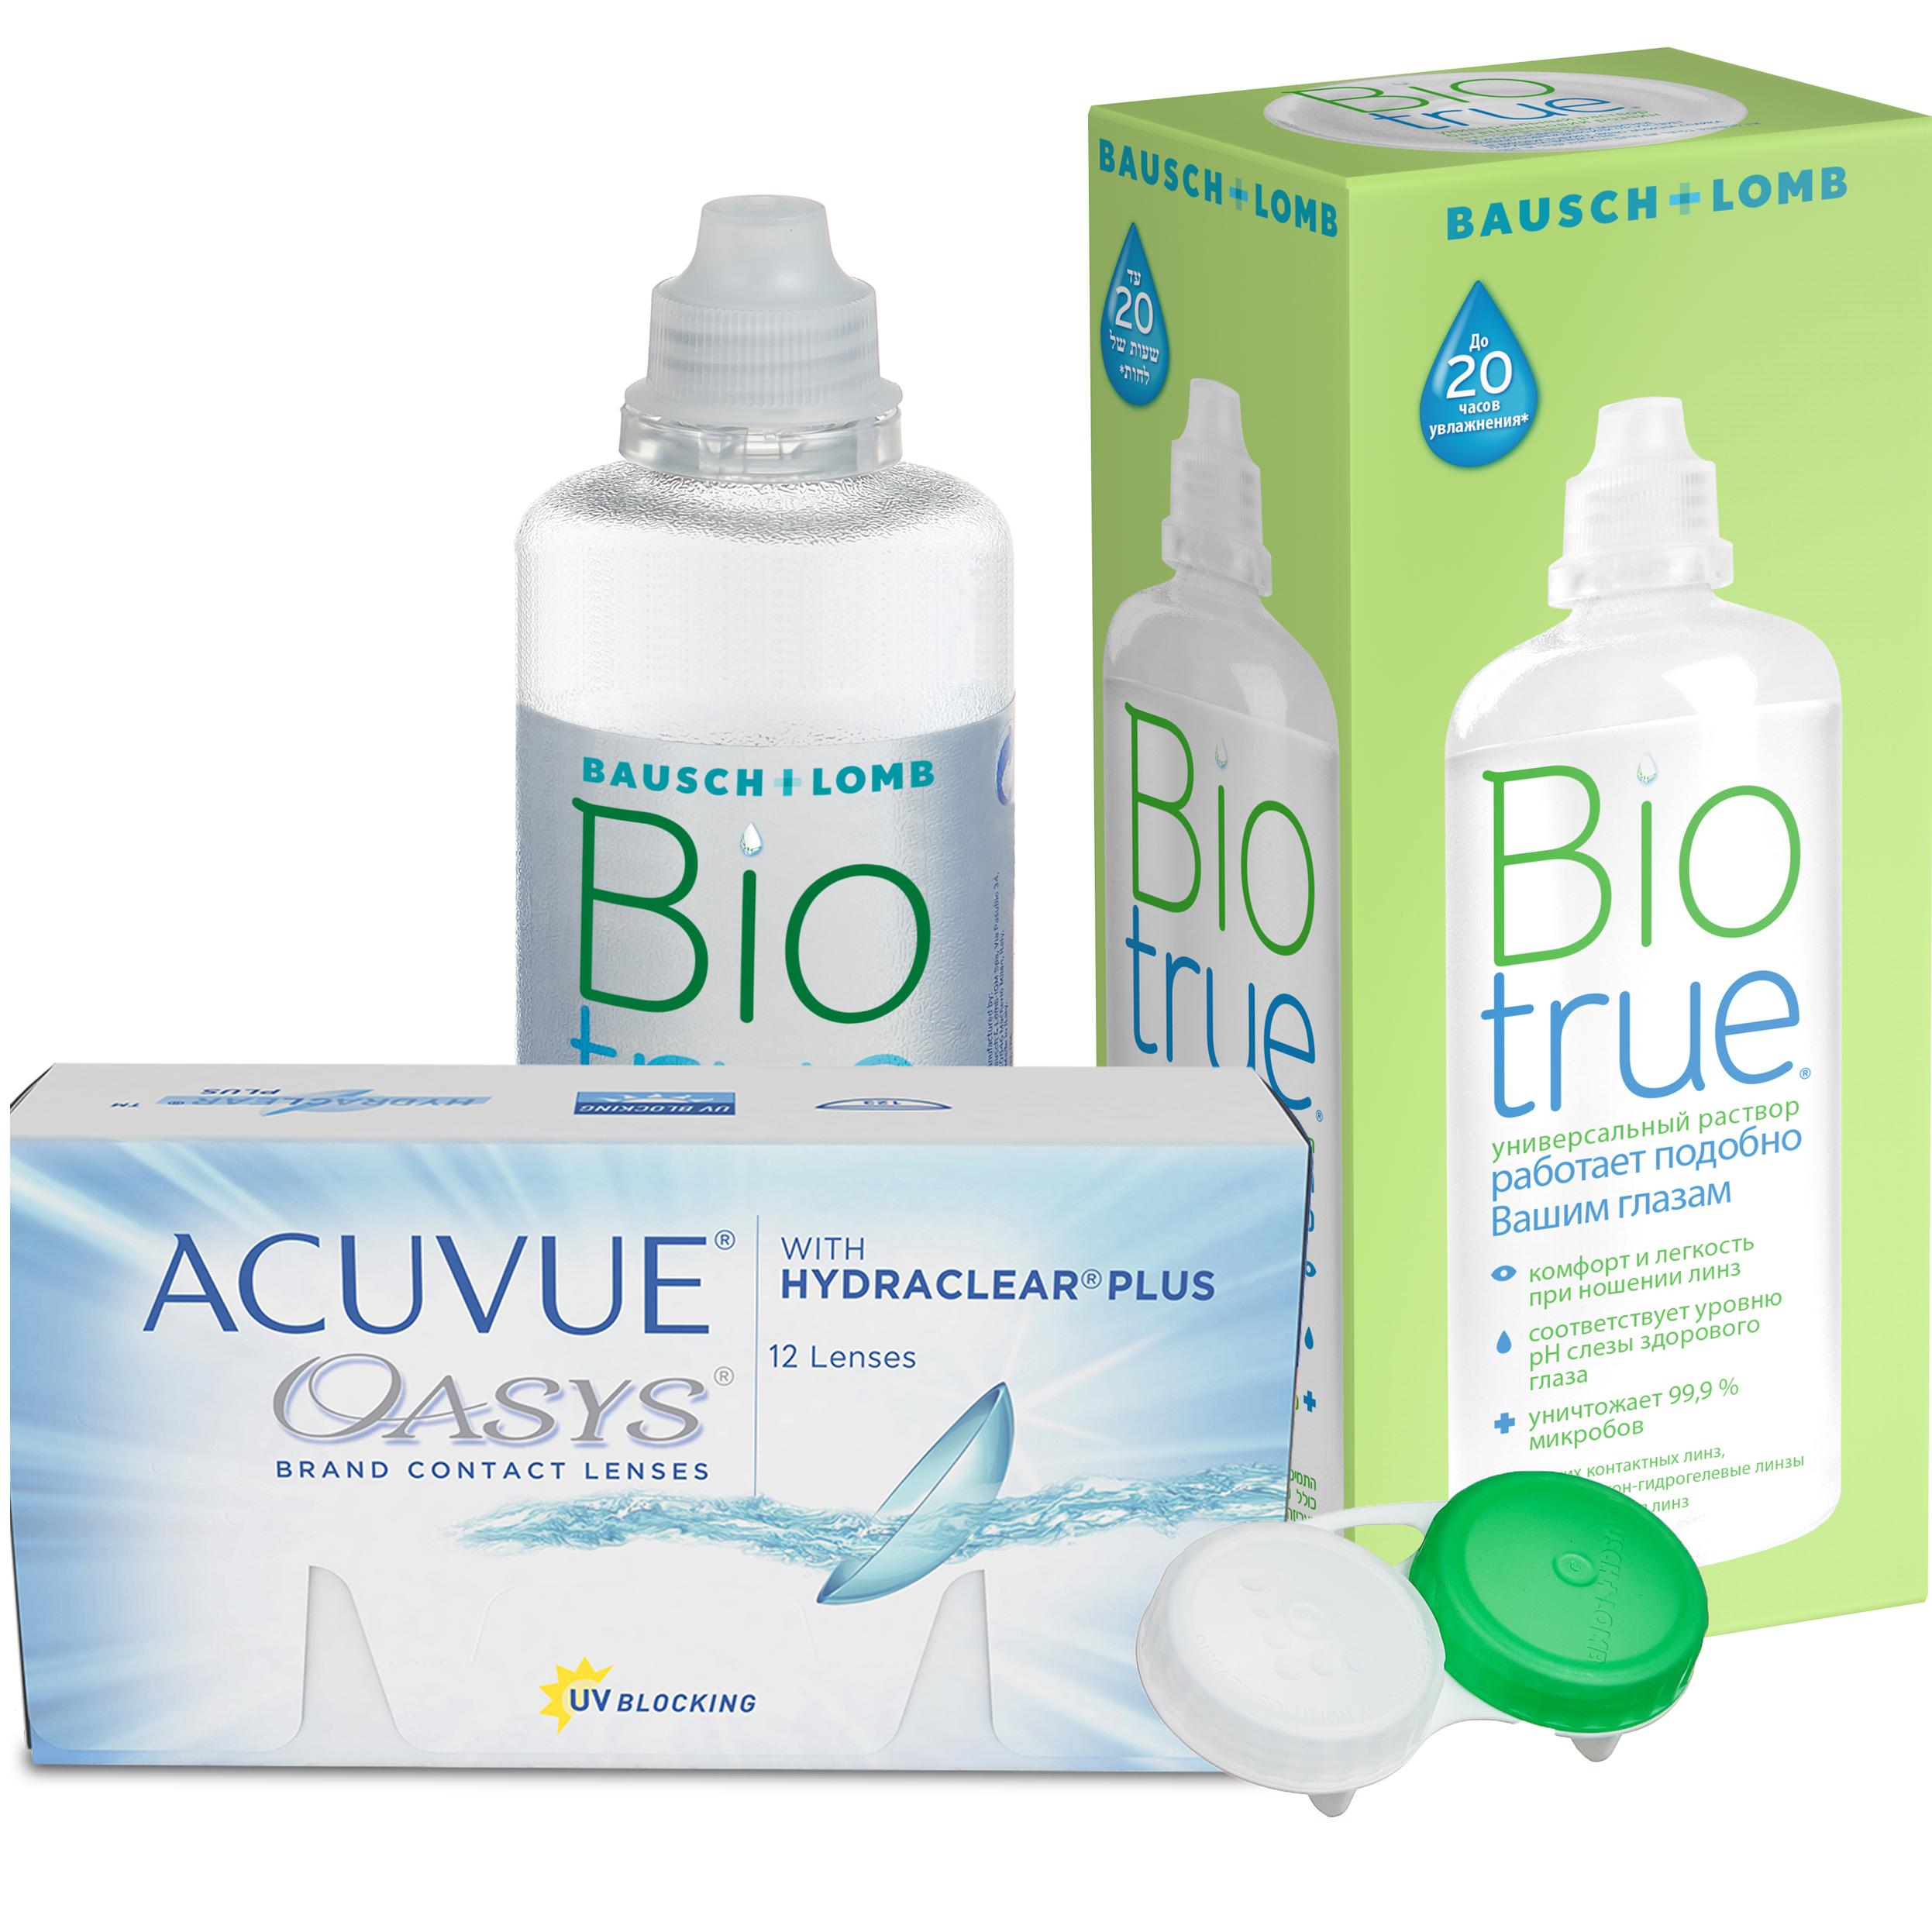 Купить Oasys with Hydraclear Plus 12 линз + Biotrue, Контактные линзы Acuvue Oasys with Hydraclear Plus 12 линз R 8.4 -6, 50 + Biotrue 300 мл